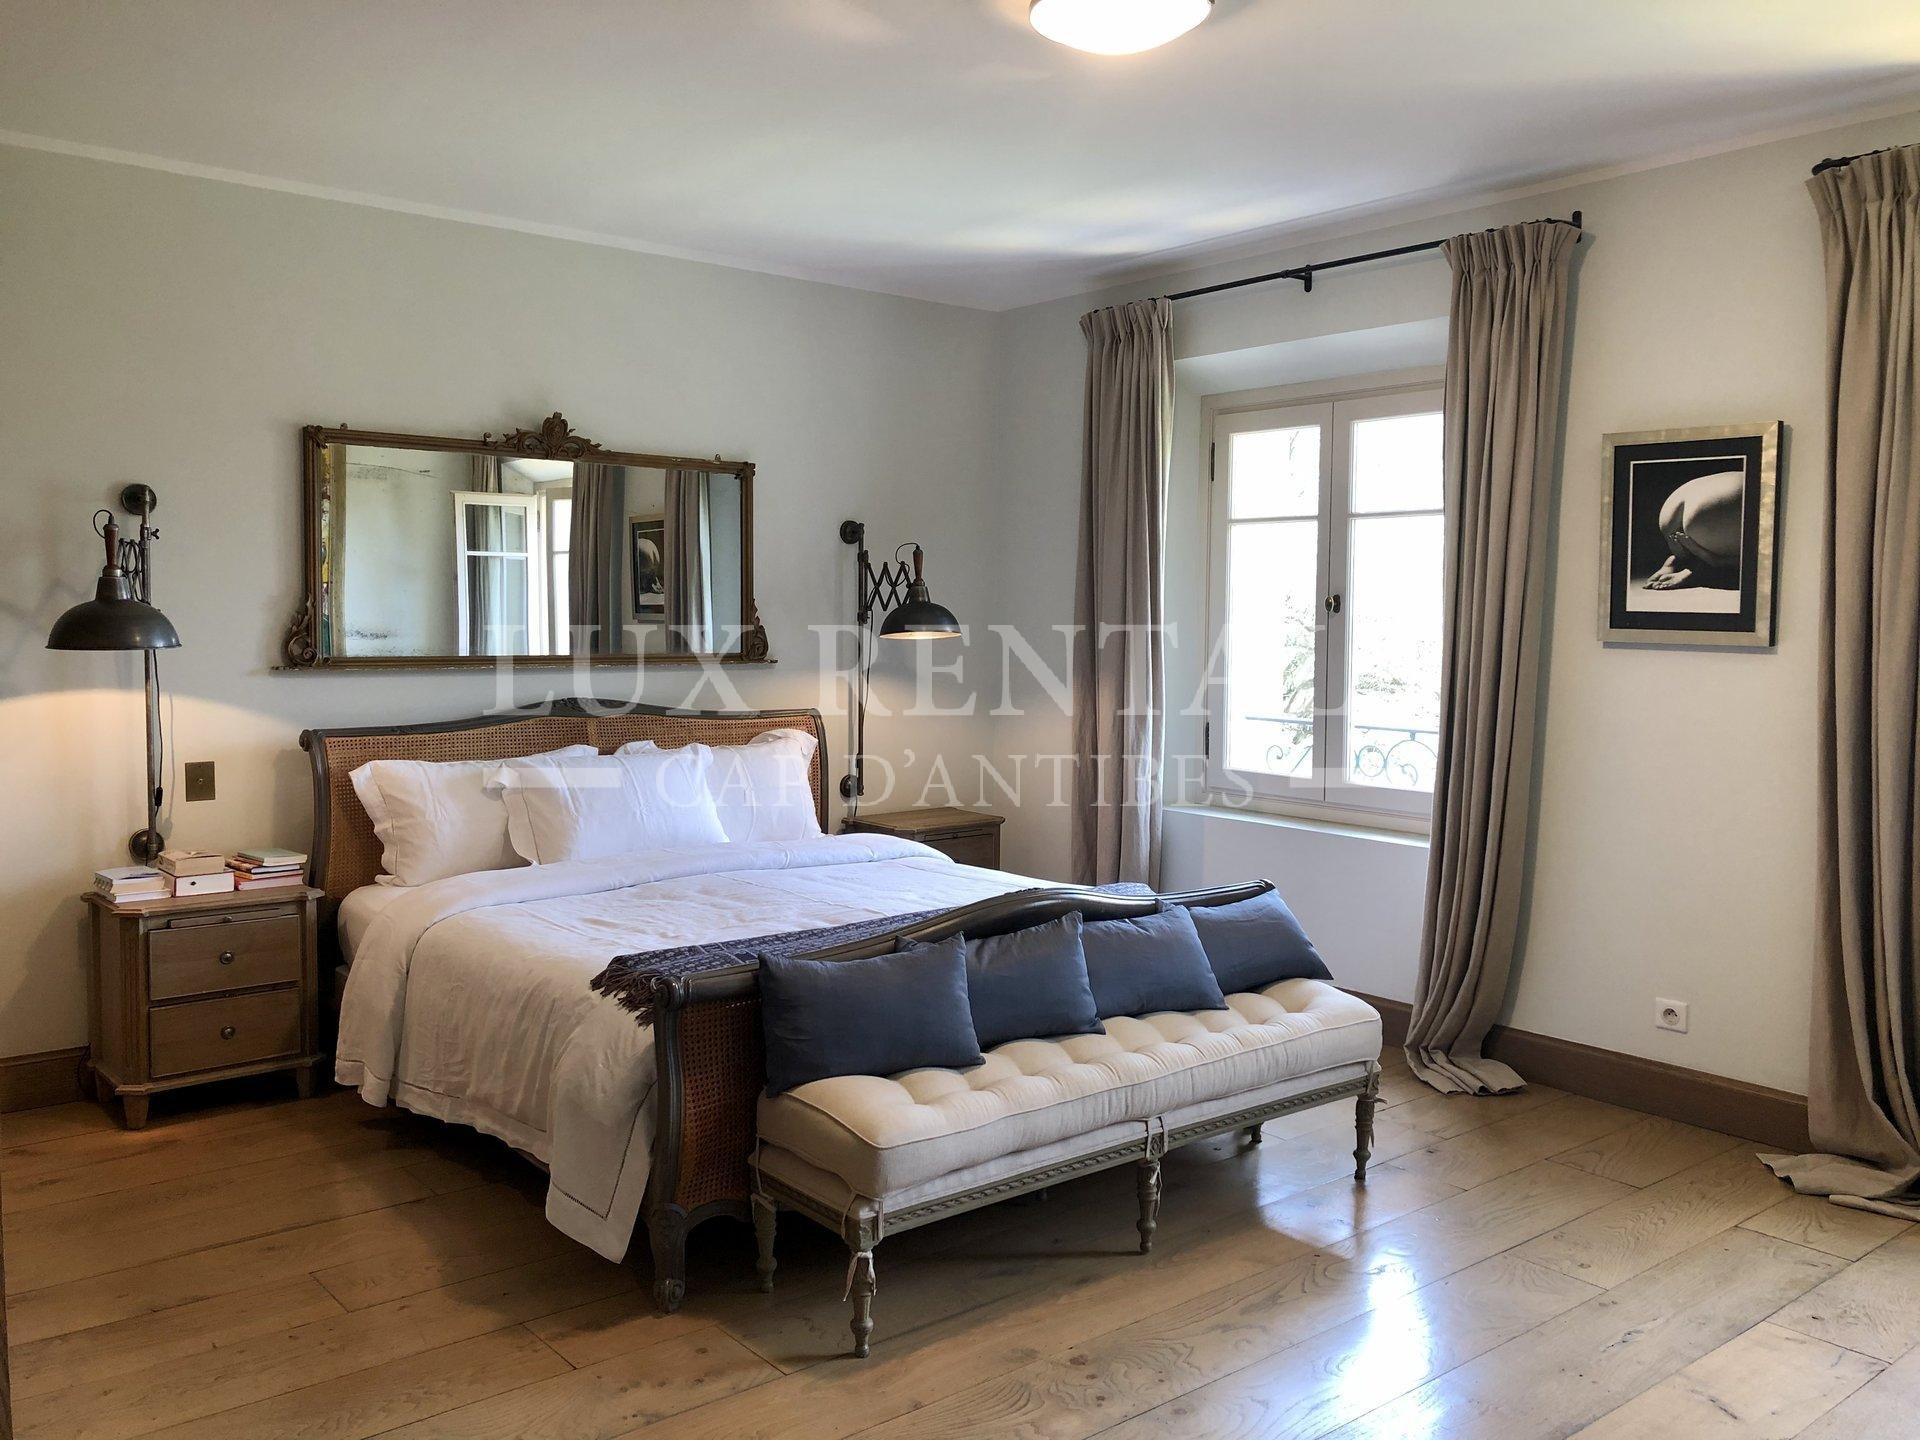 Сезонная аренда Вилла - Кап д'Антиб (Cap d'Antibes)